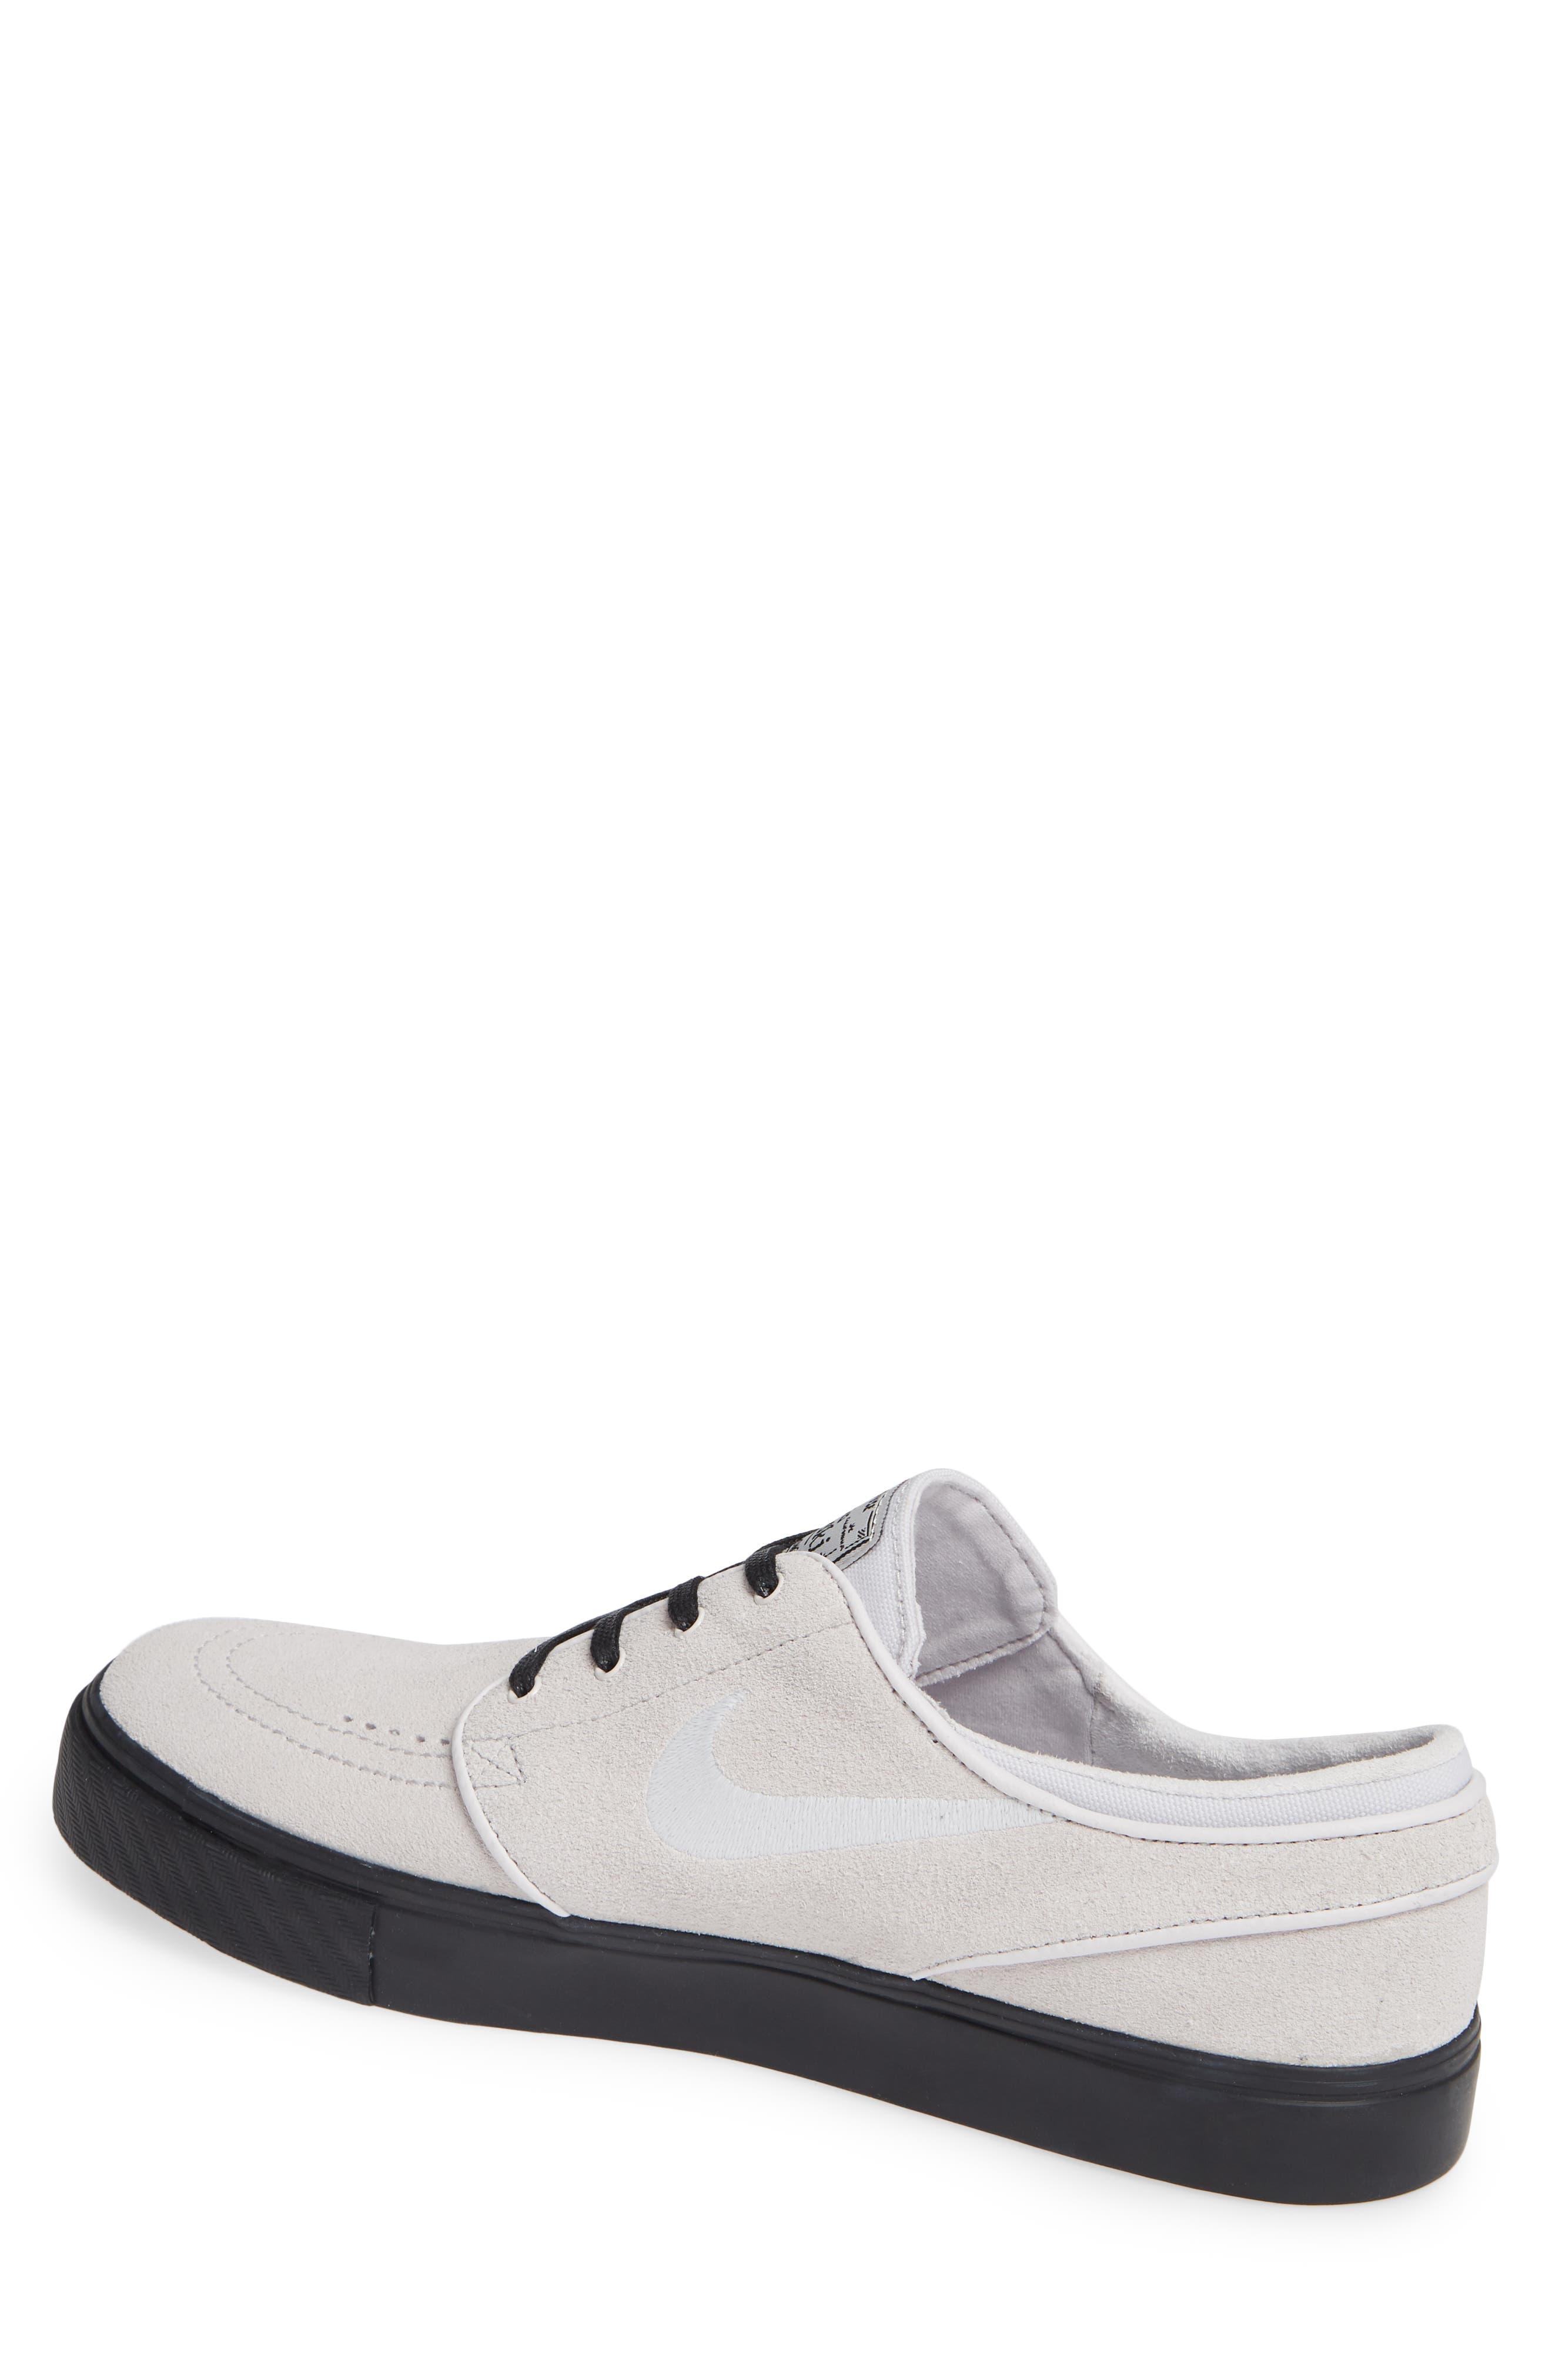 'Zoom - Stefan Janoski' Skate Shoe,                             Alternate thumbnail 2, color,                             068